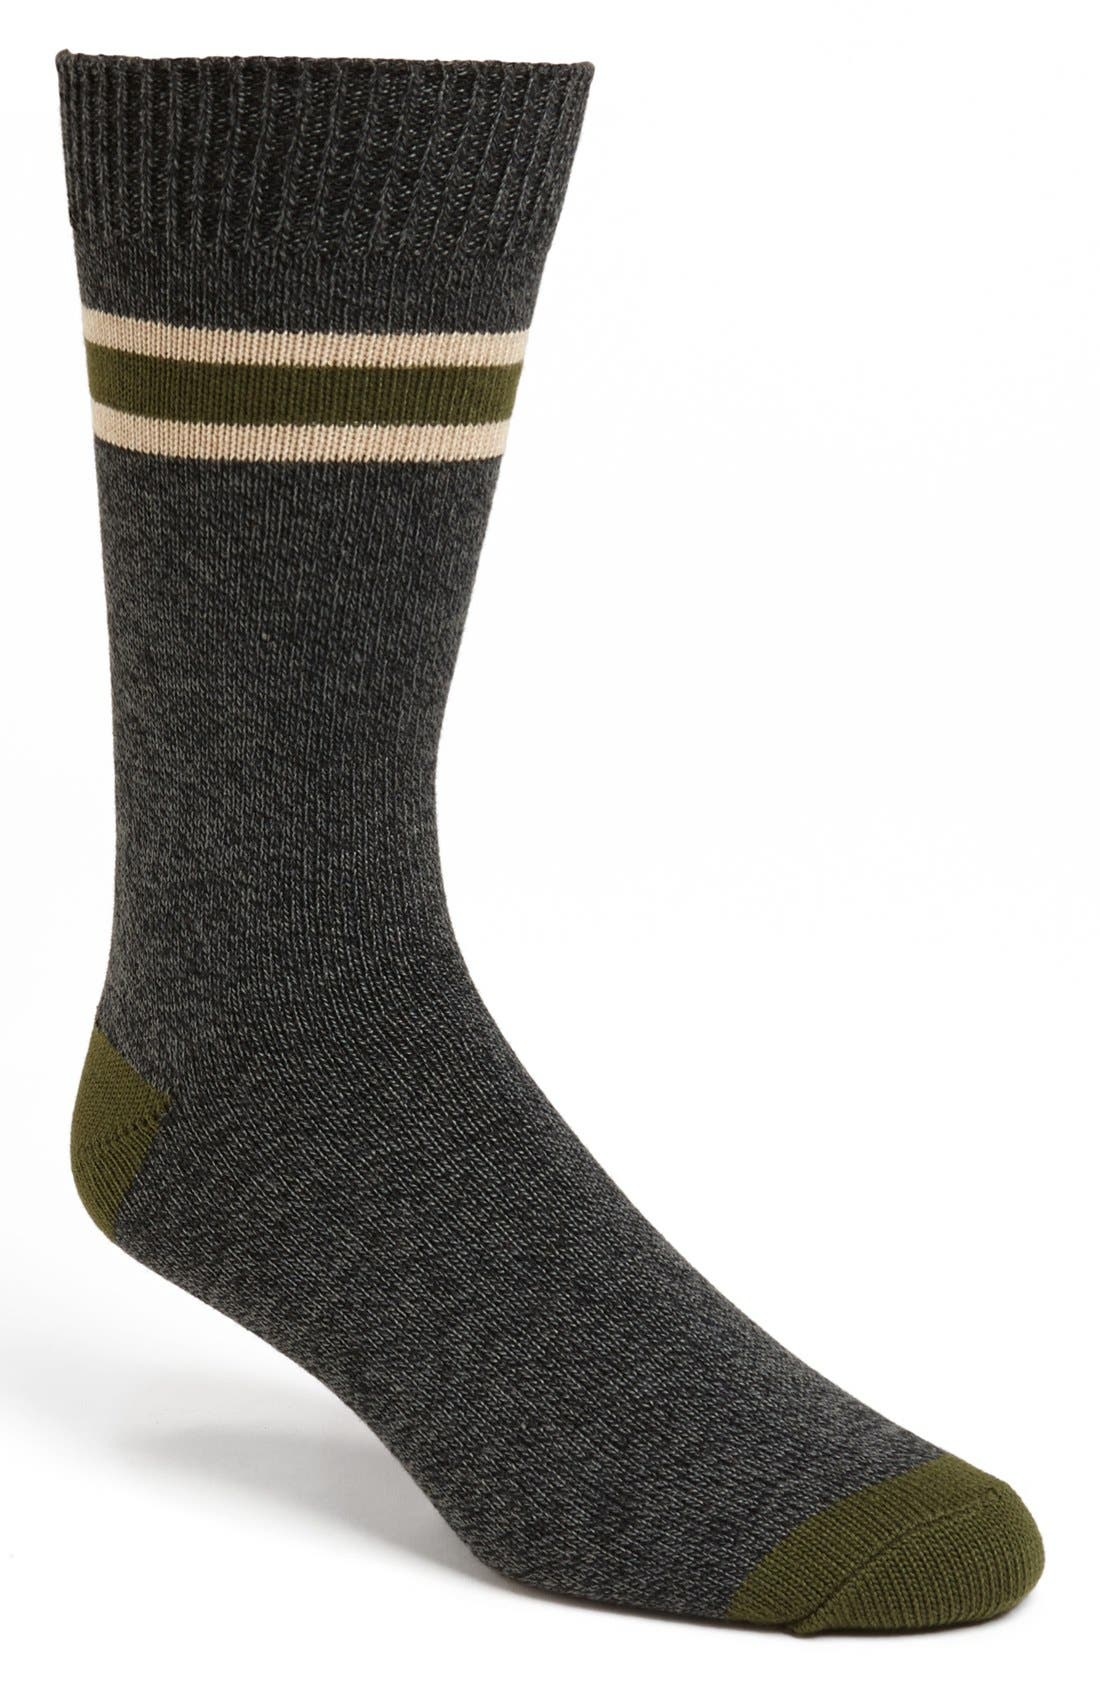 Alternate Image 1 Selected - Tretorn Multi Stripe Knit Socks